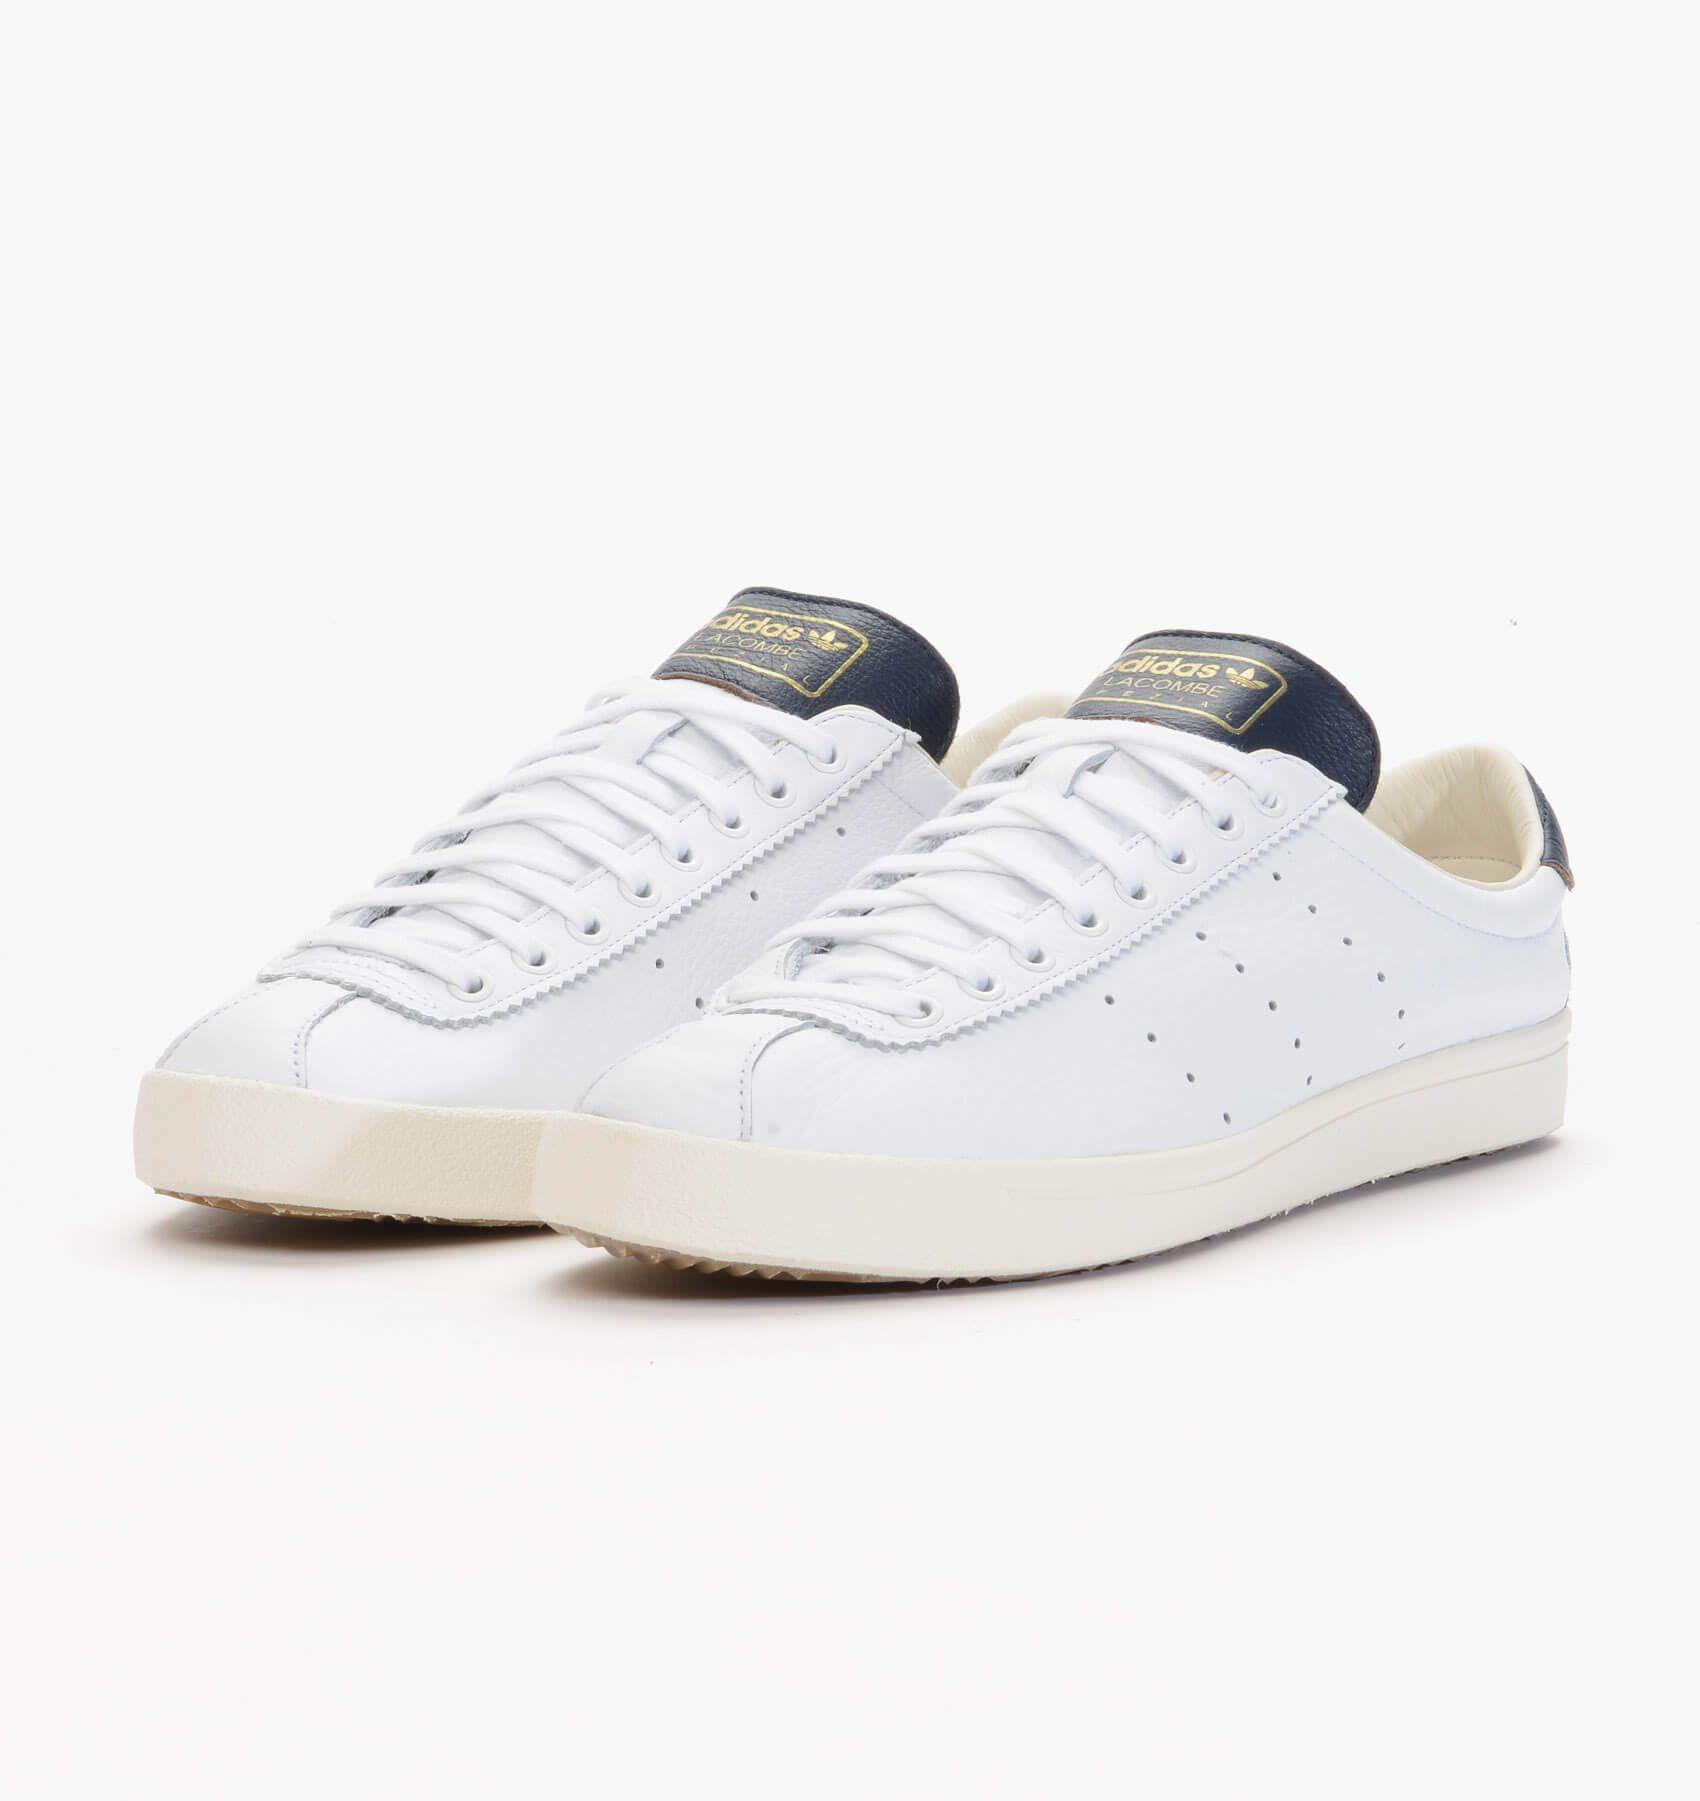 Adidas spzl Lacombe blanco Collegiate Navy Pinterest adidas